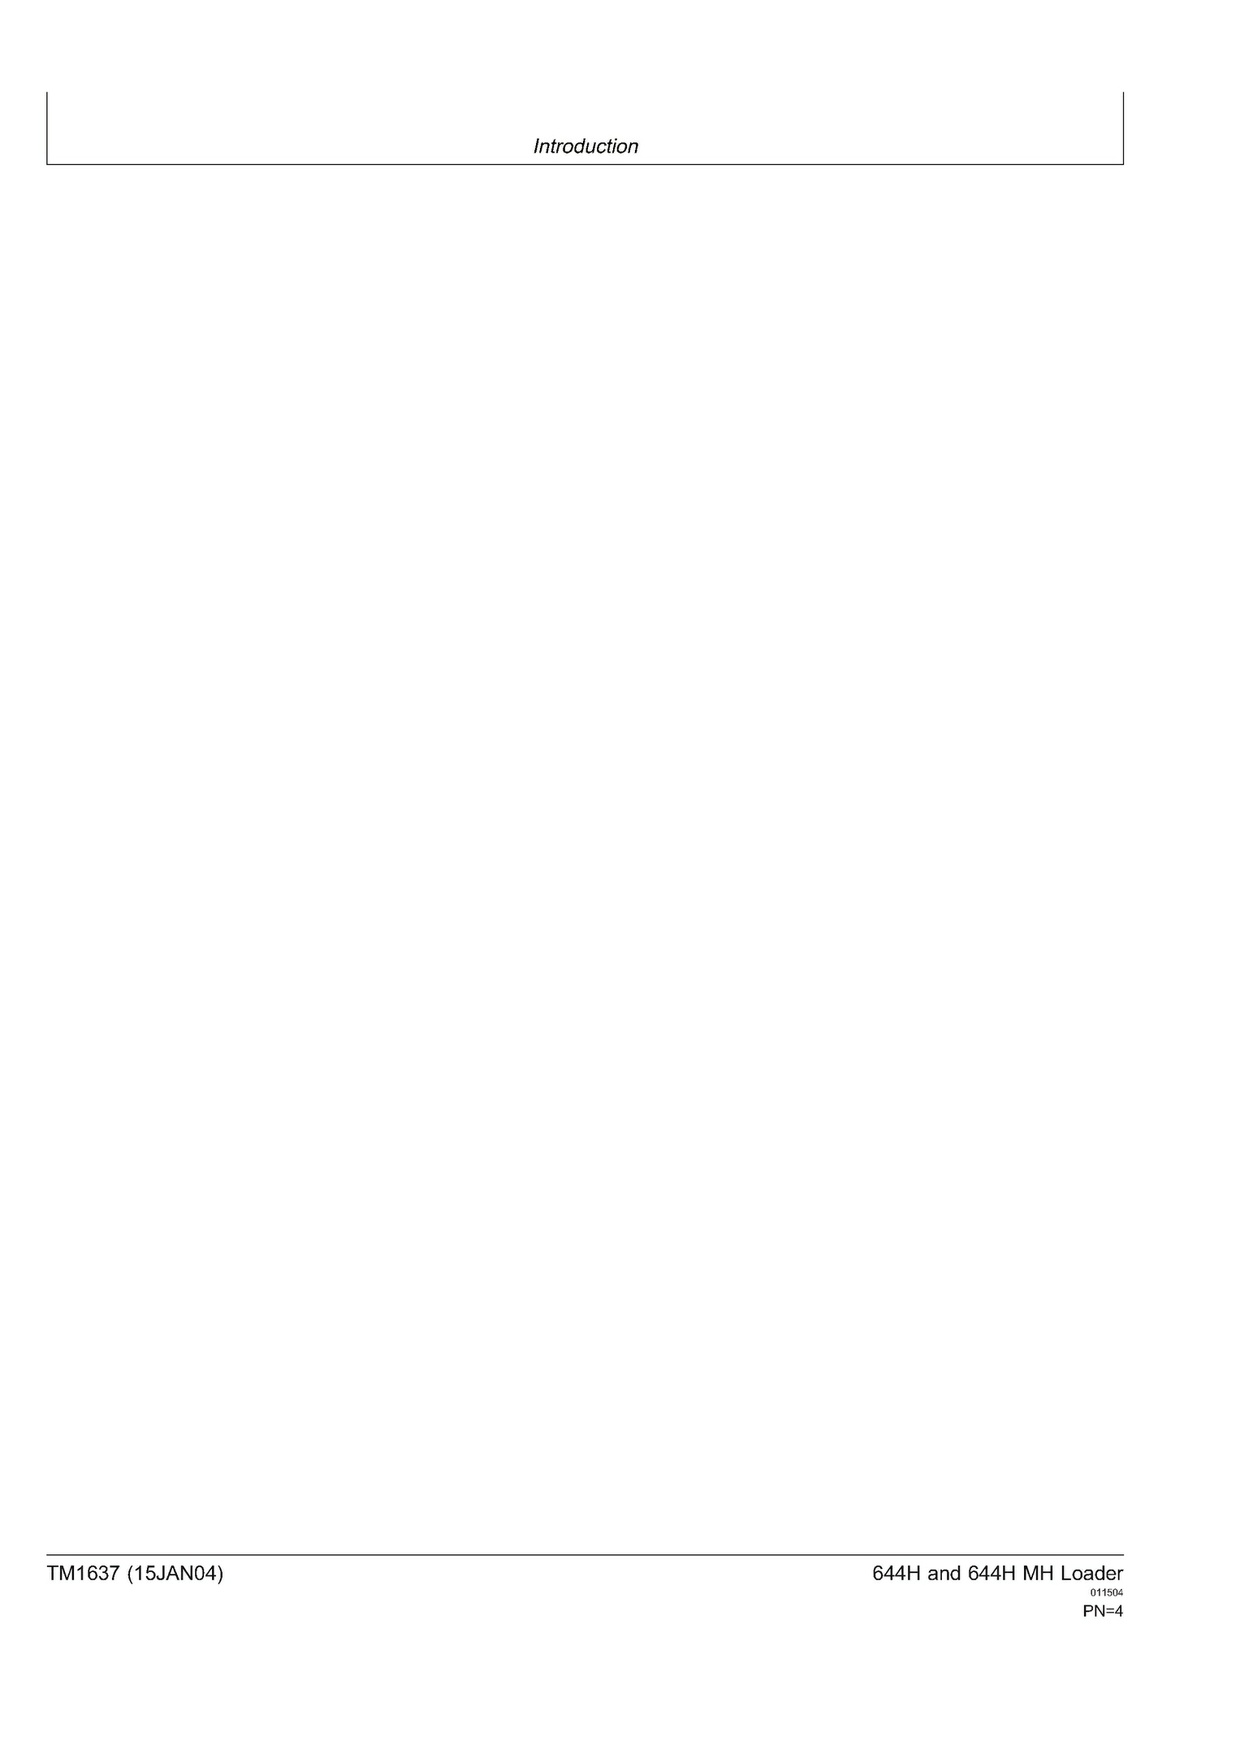 PDF Download John Deere 644H 644H MH WHEEL LOADER OPERATION AND TEST MANUAL DOWNLOAD TM1634